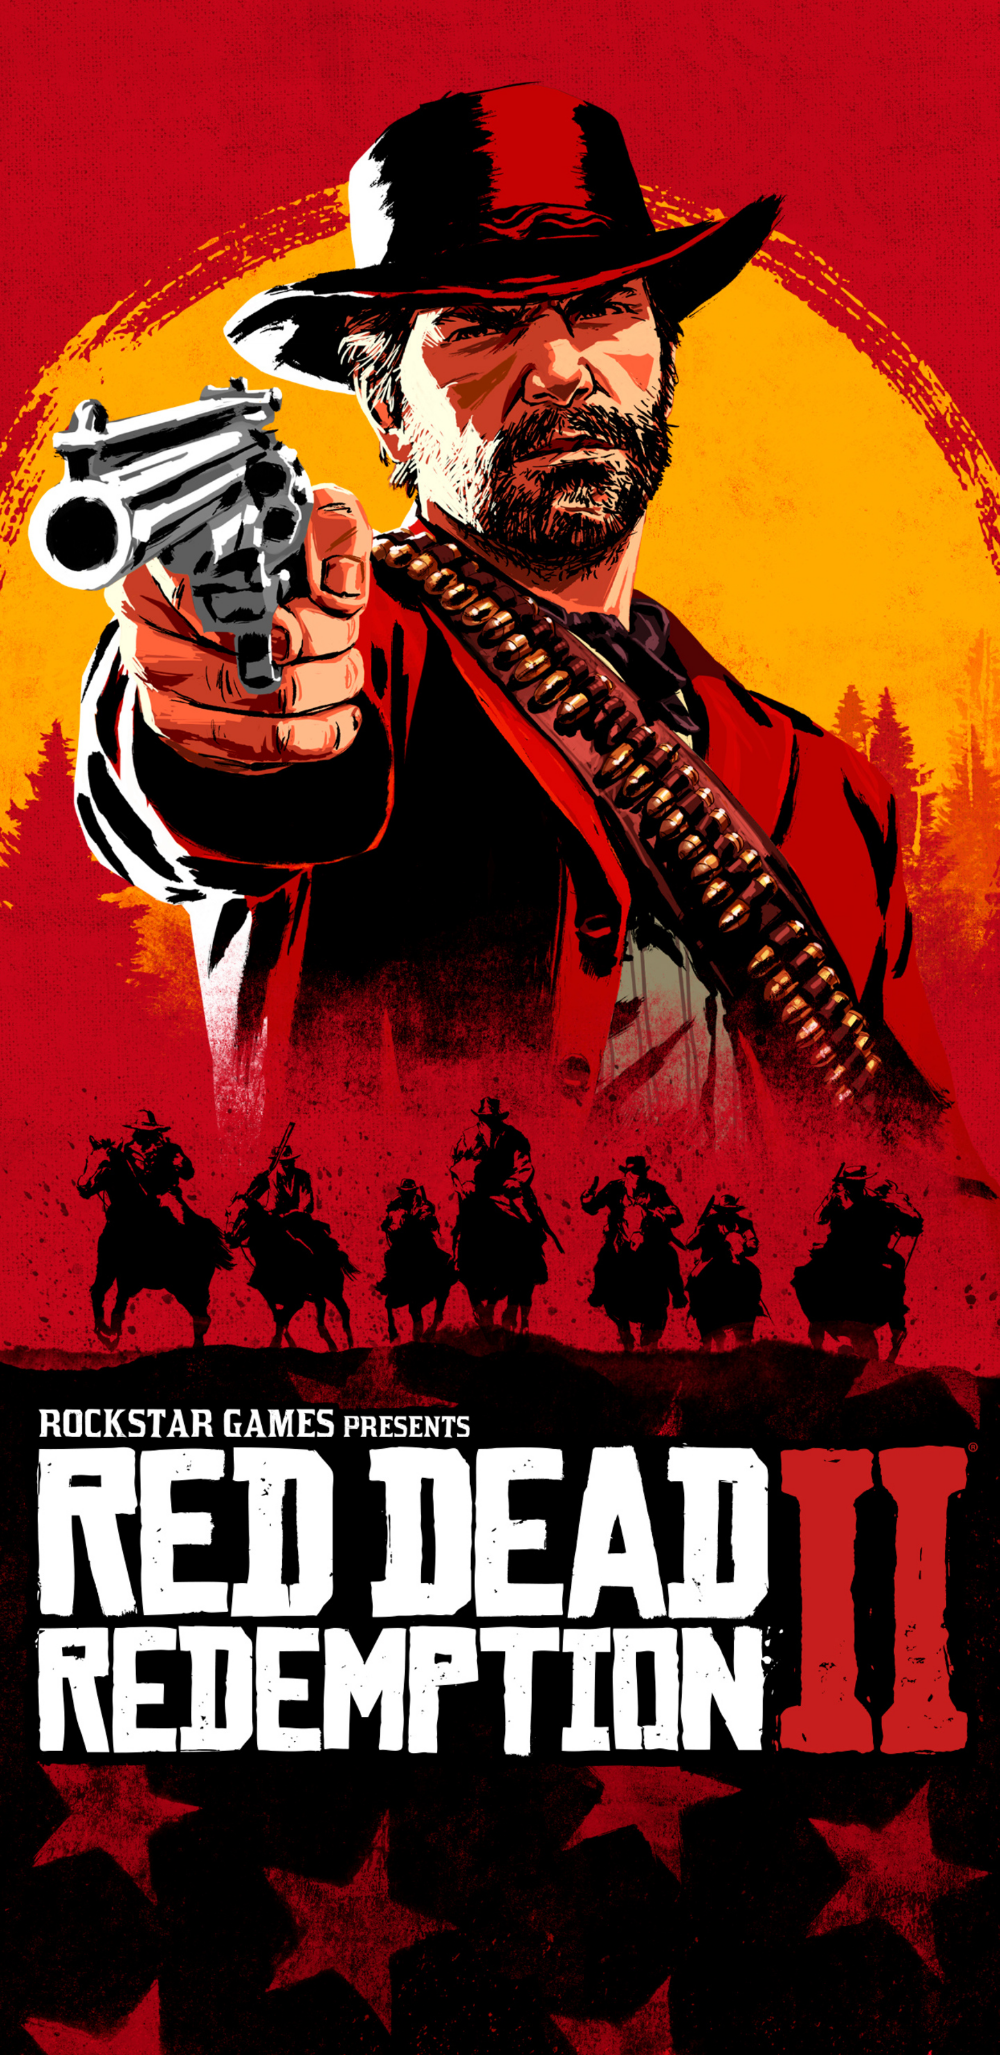 Red Dead Redemption 2 Posters De Filmes Jogos Ps4 Jogos De Video Game